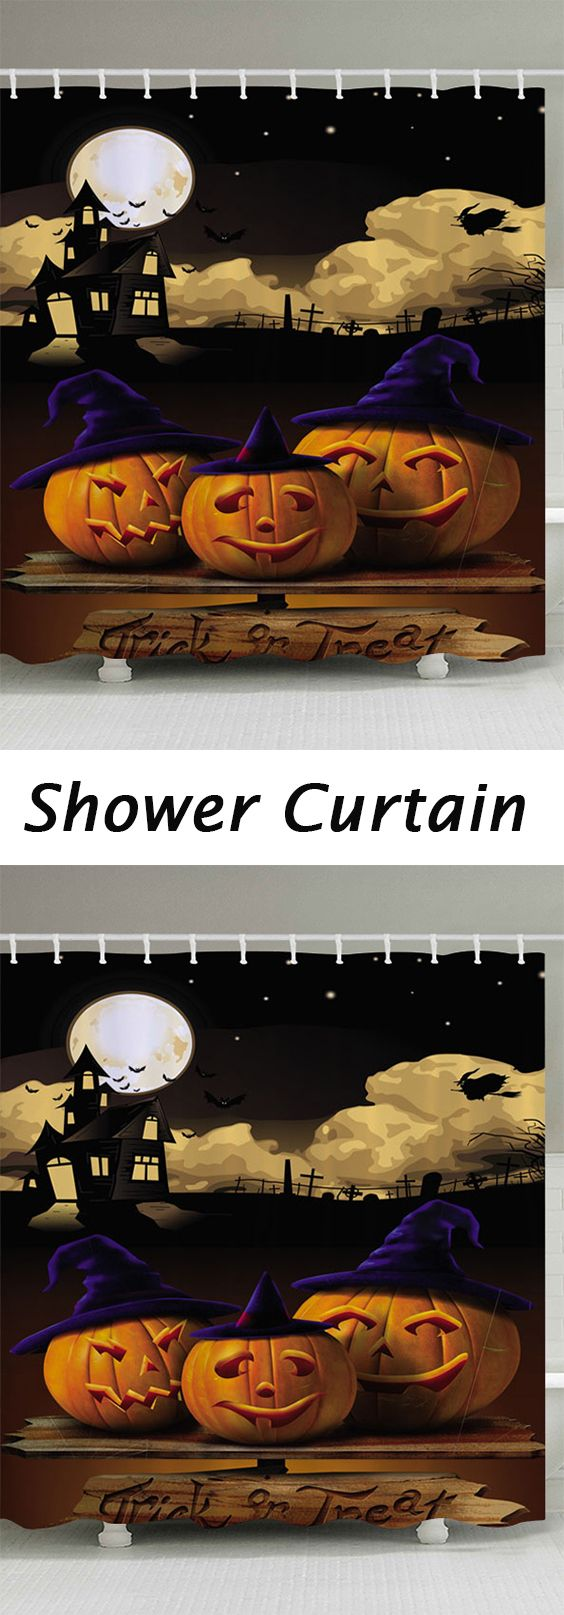 halloween decor ideas:Halloween Pumpkin Moon Print Fabric Bathroom Shower Curtain